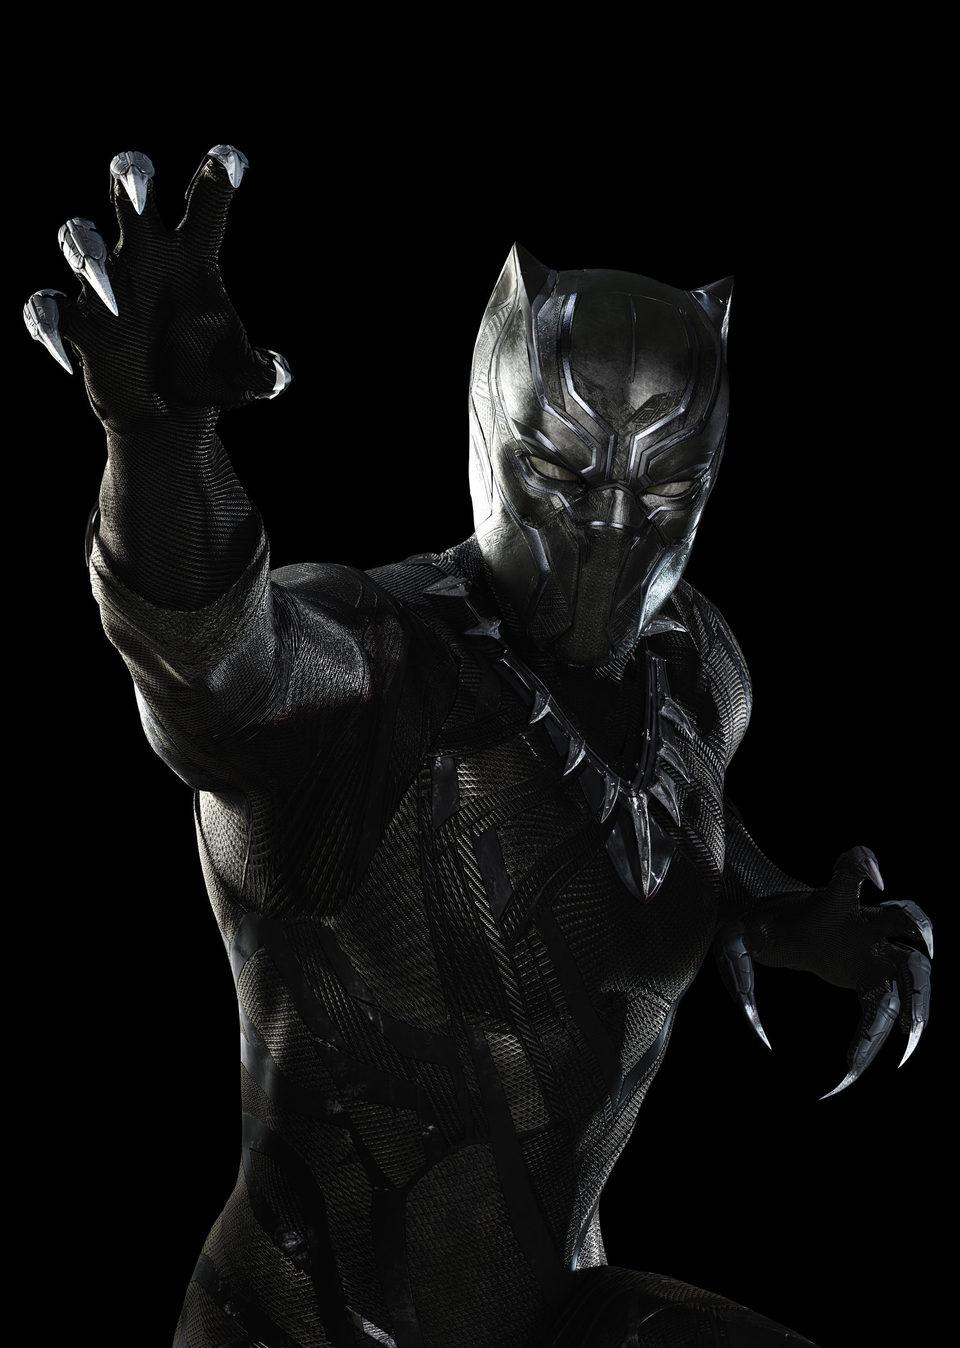 Capitán América: Civil War, fotograma 14 de 58